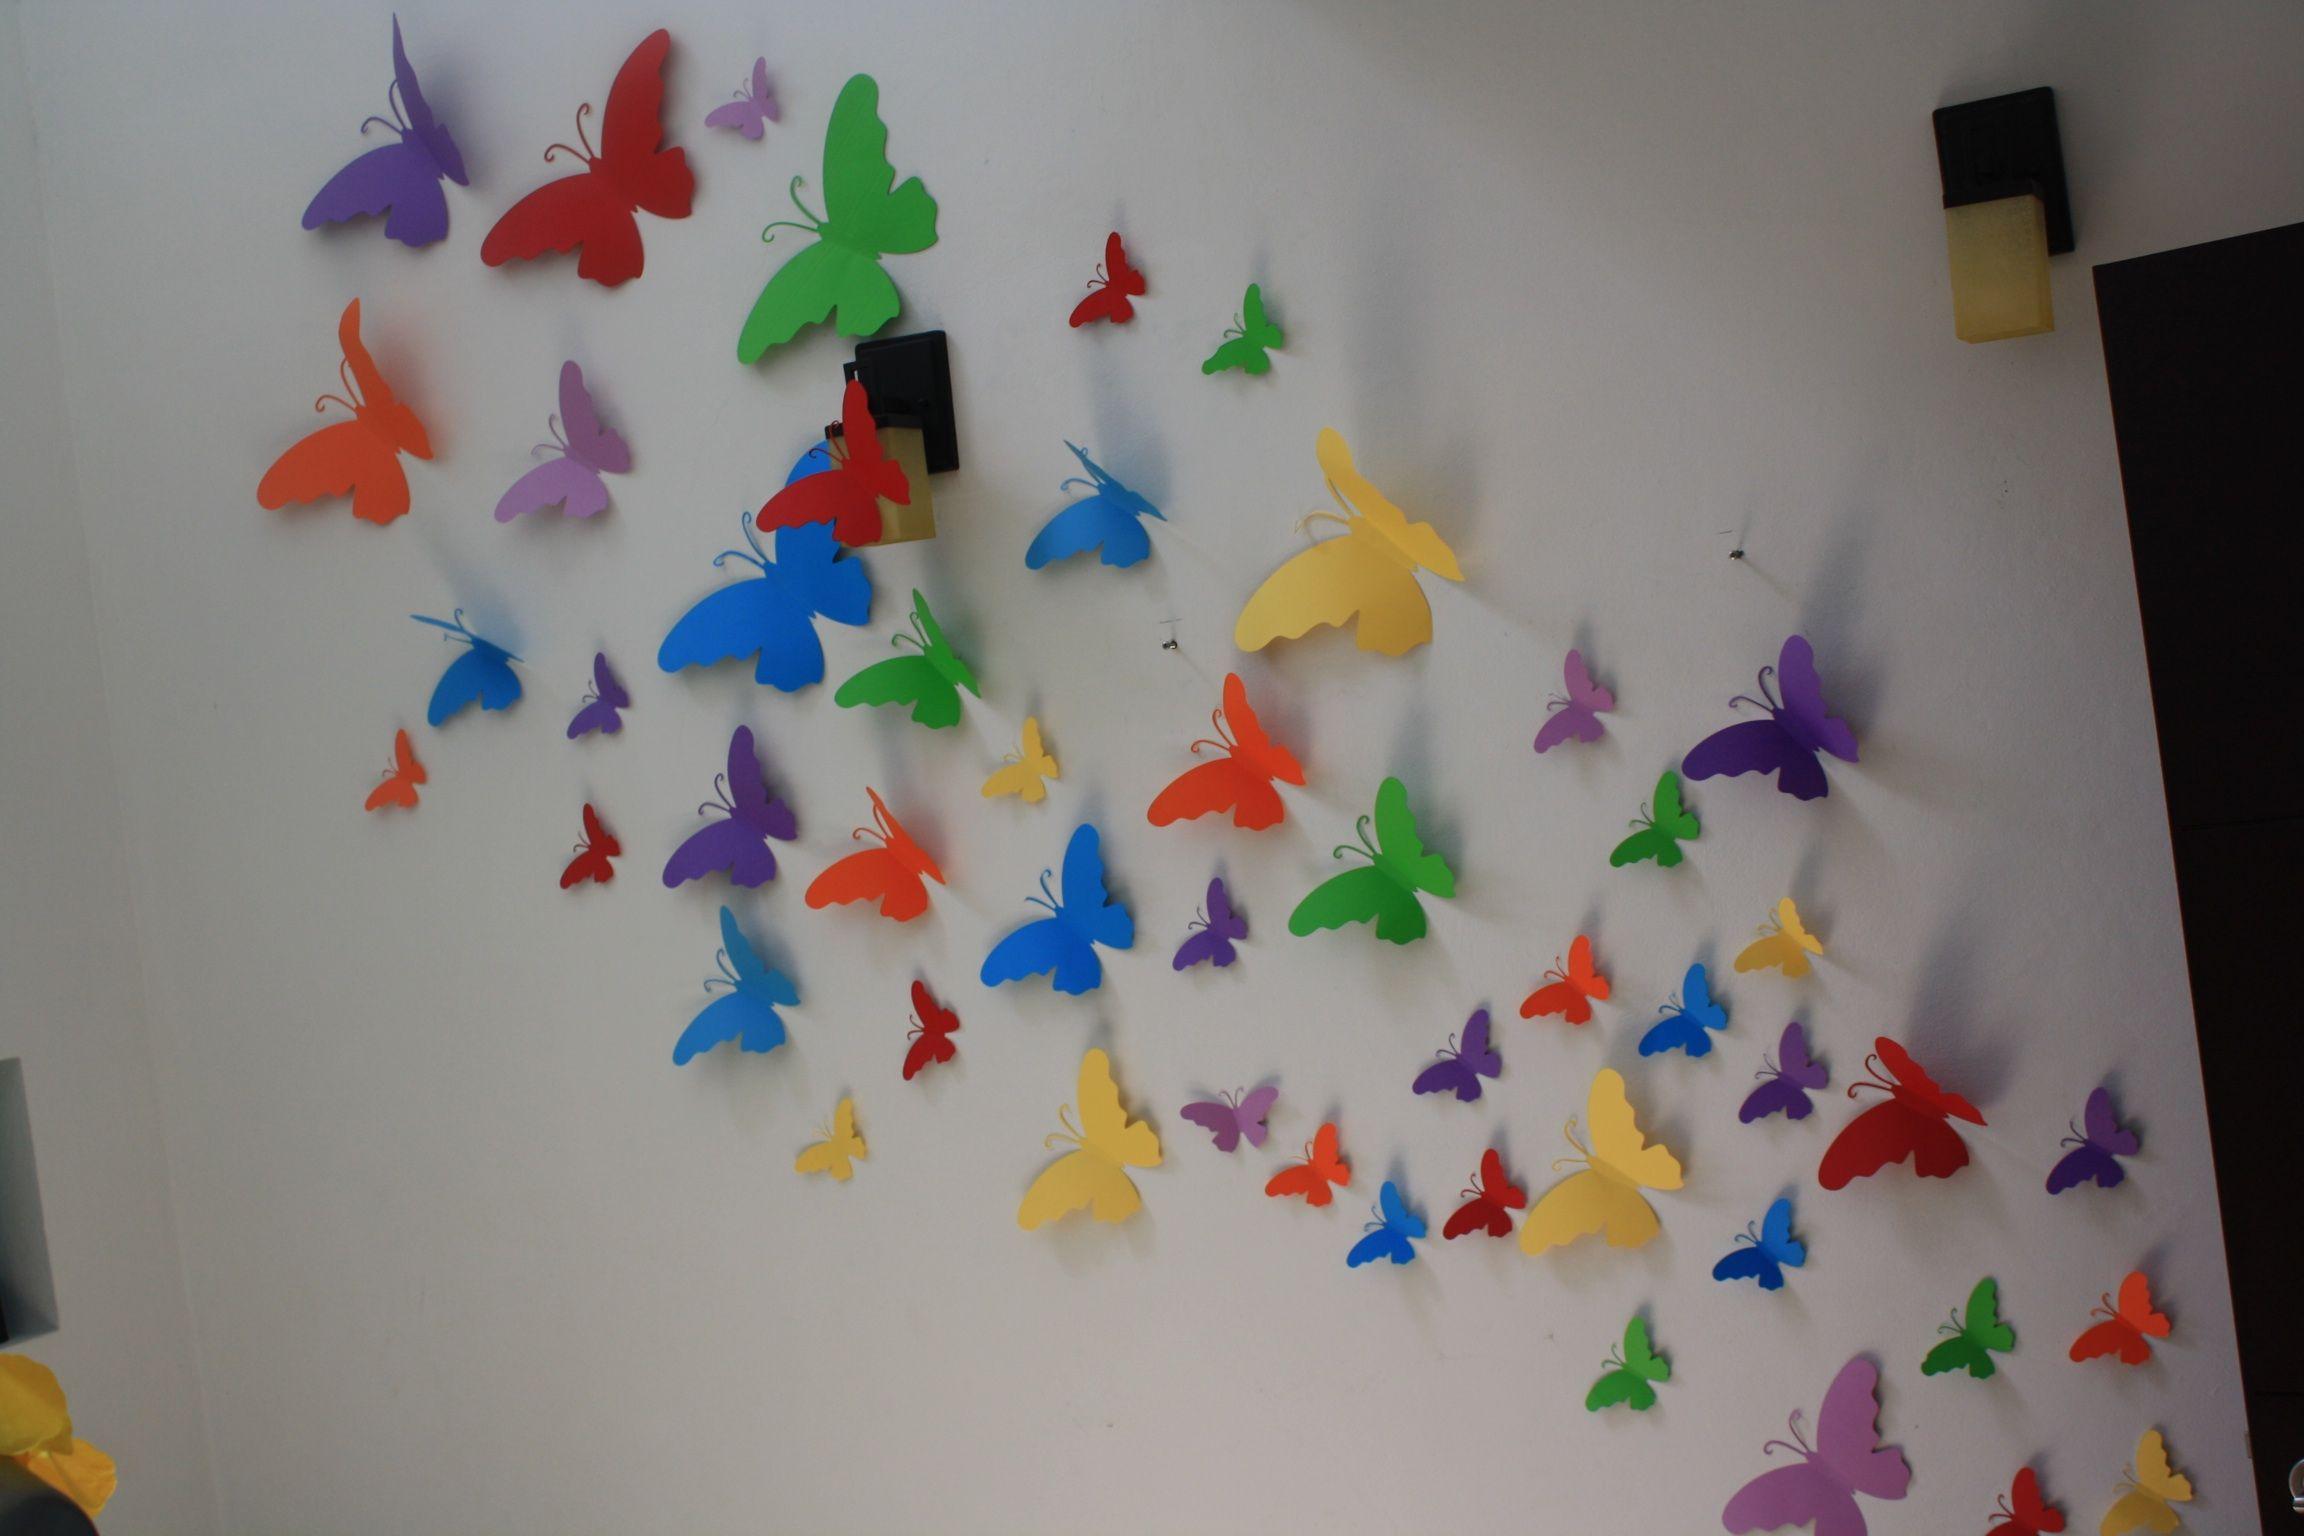 Paquete de mariposas para las paredes 400 pesos buscamos - Diseno de paredes ...